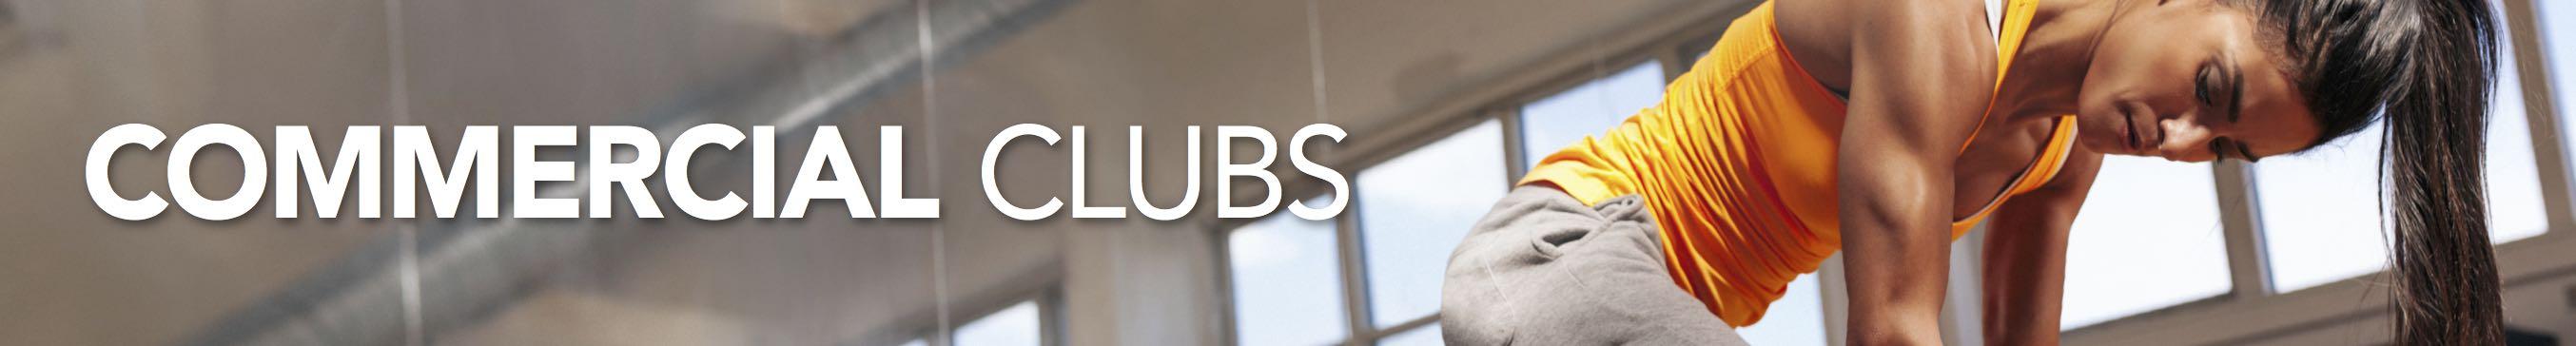 commerical-clubs-banner.jpg